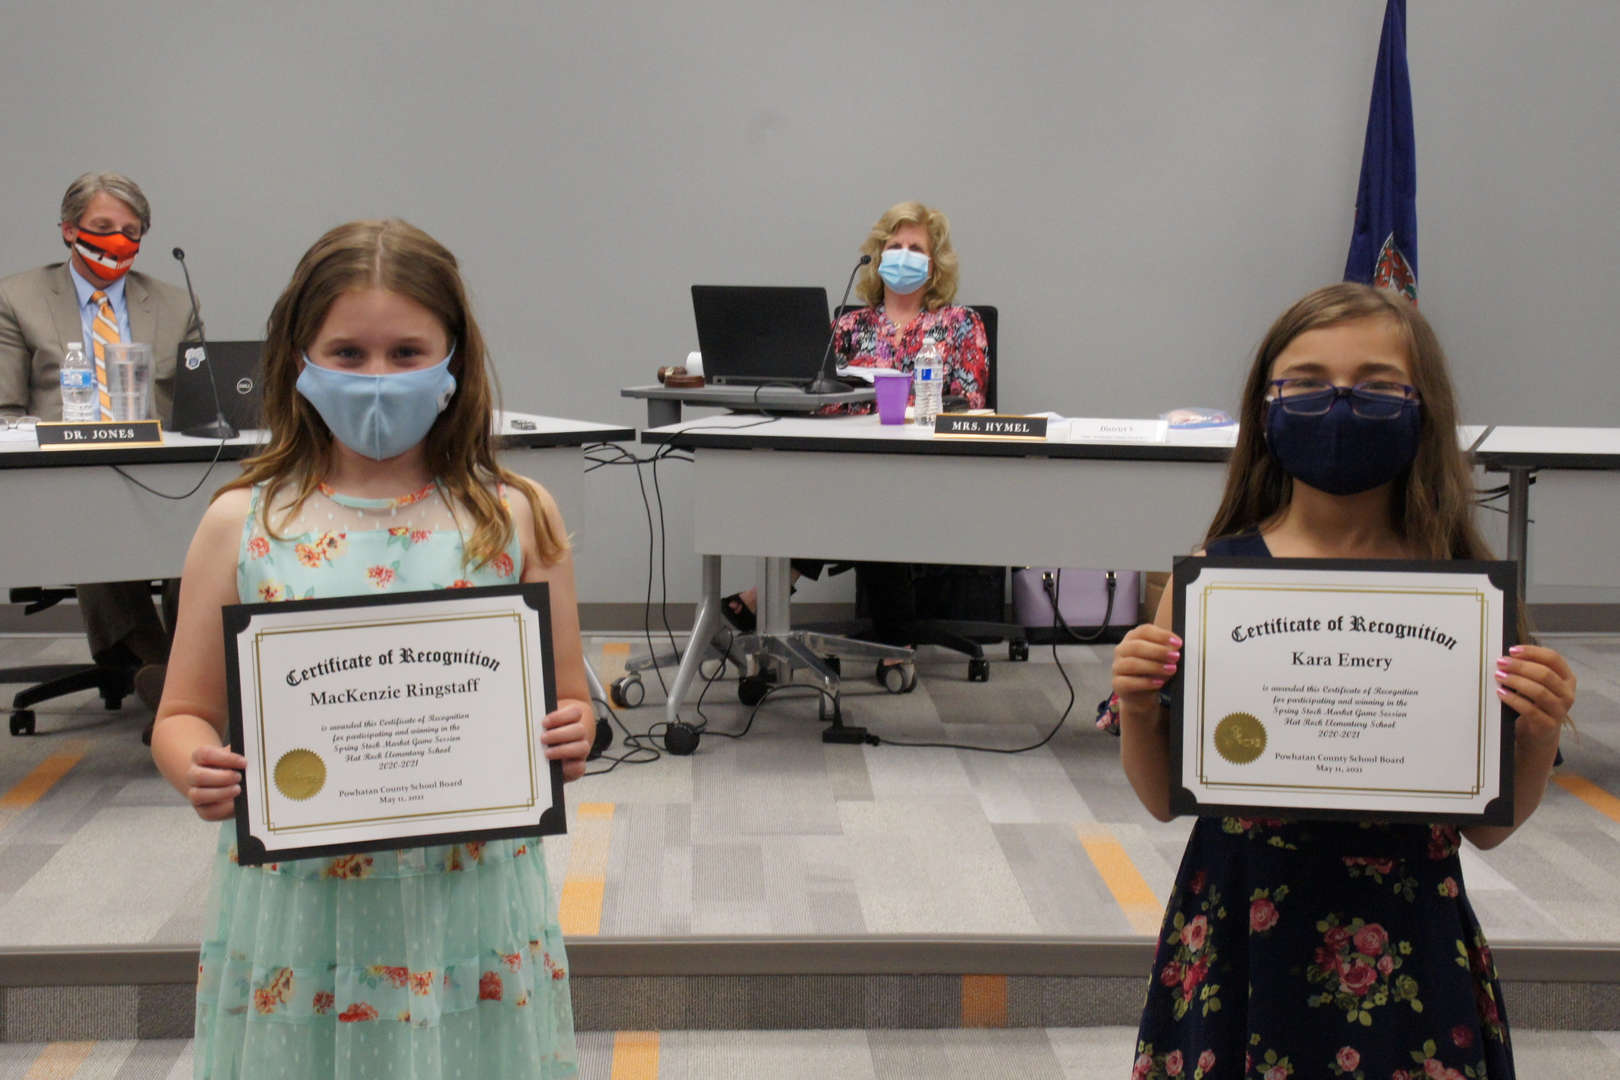 MacKenzie Ringstaff & Kara Emery receive awards